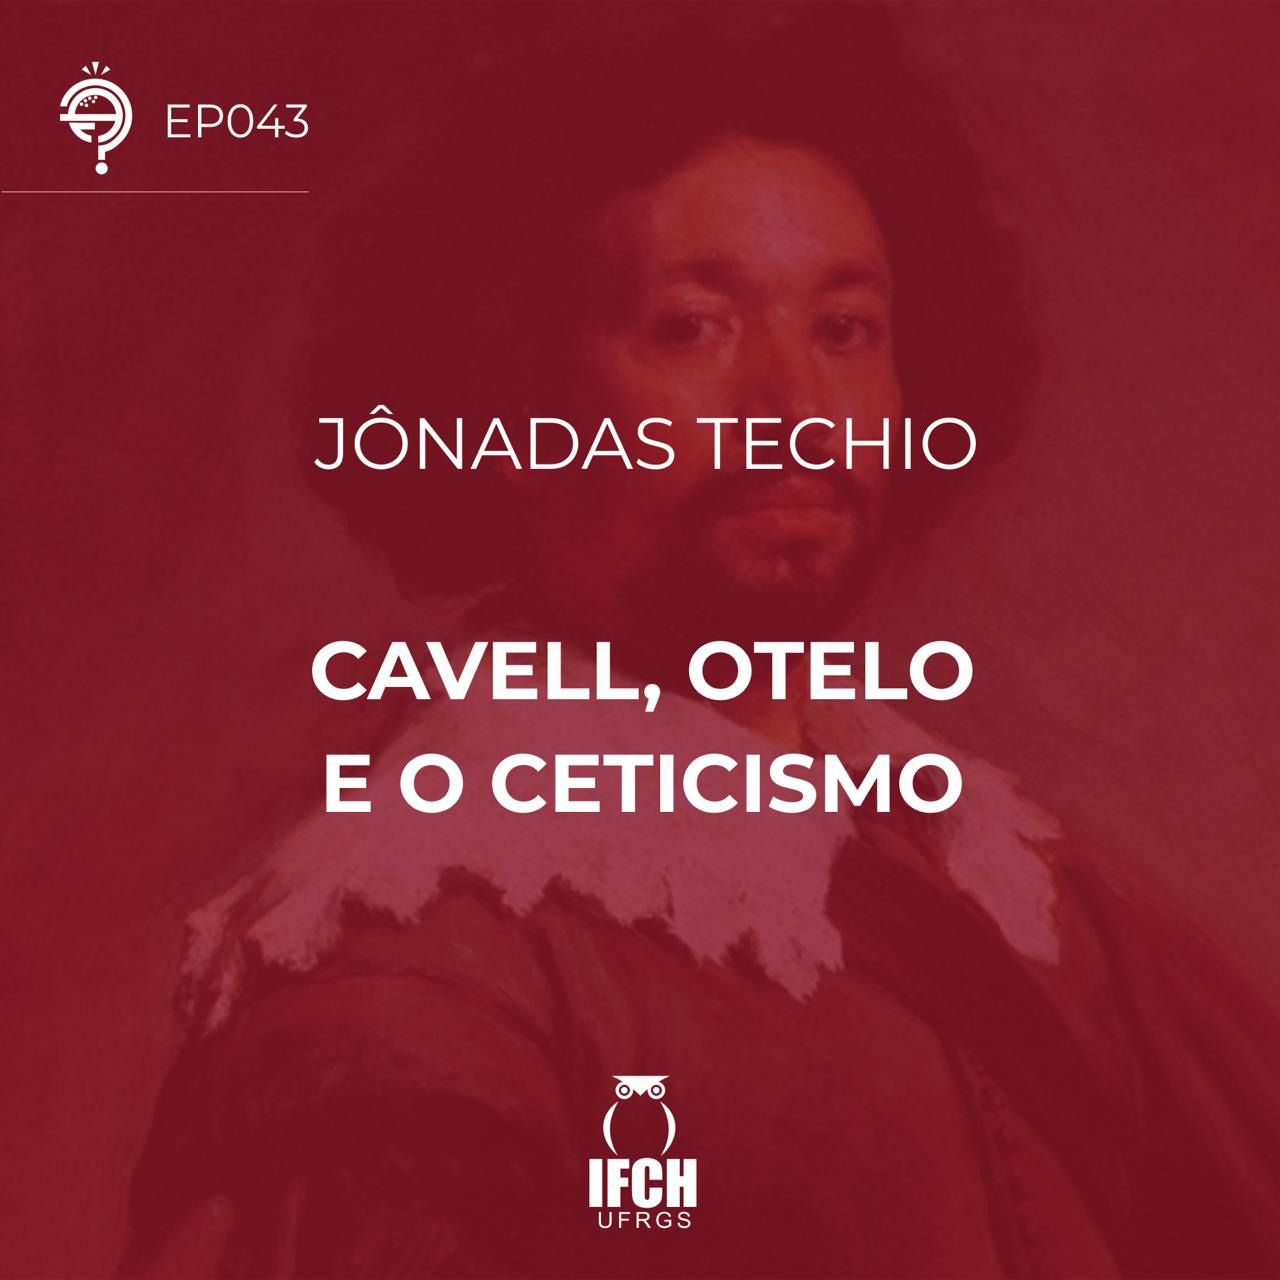 Ep. 043: Cavell, Otelo e o ceticismo